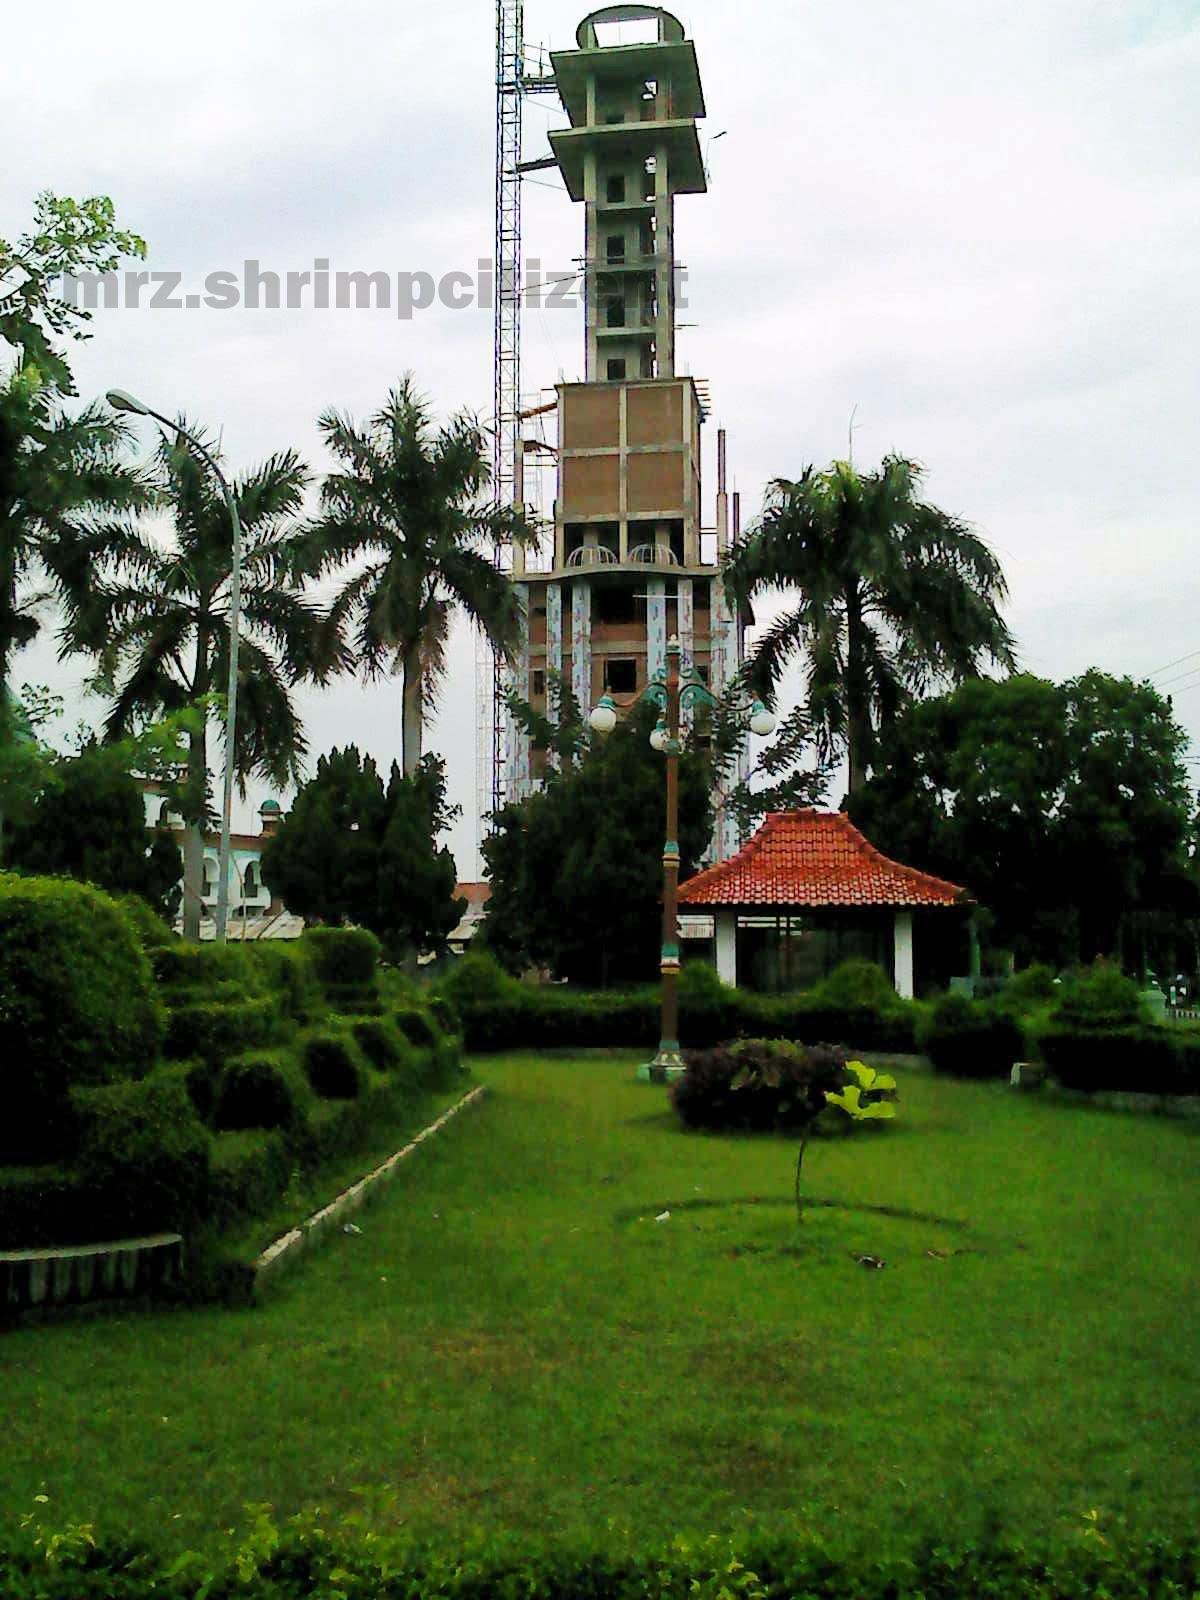 Pembangunan Menara Masjid Agung Sumber, Kab. Cirebon 2